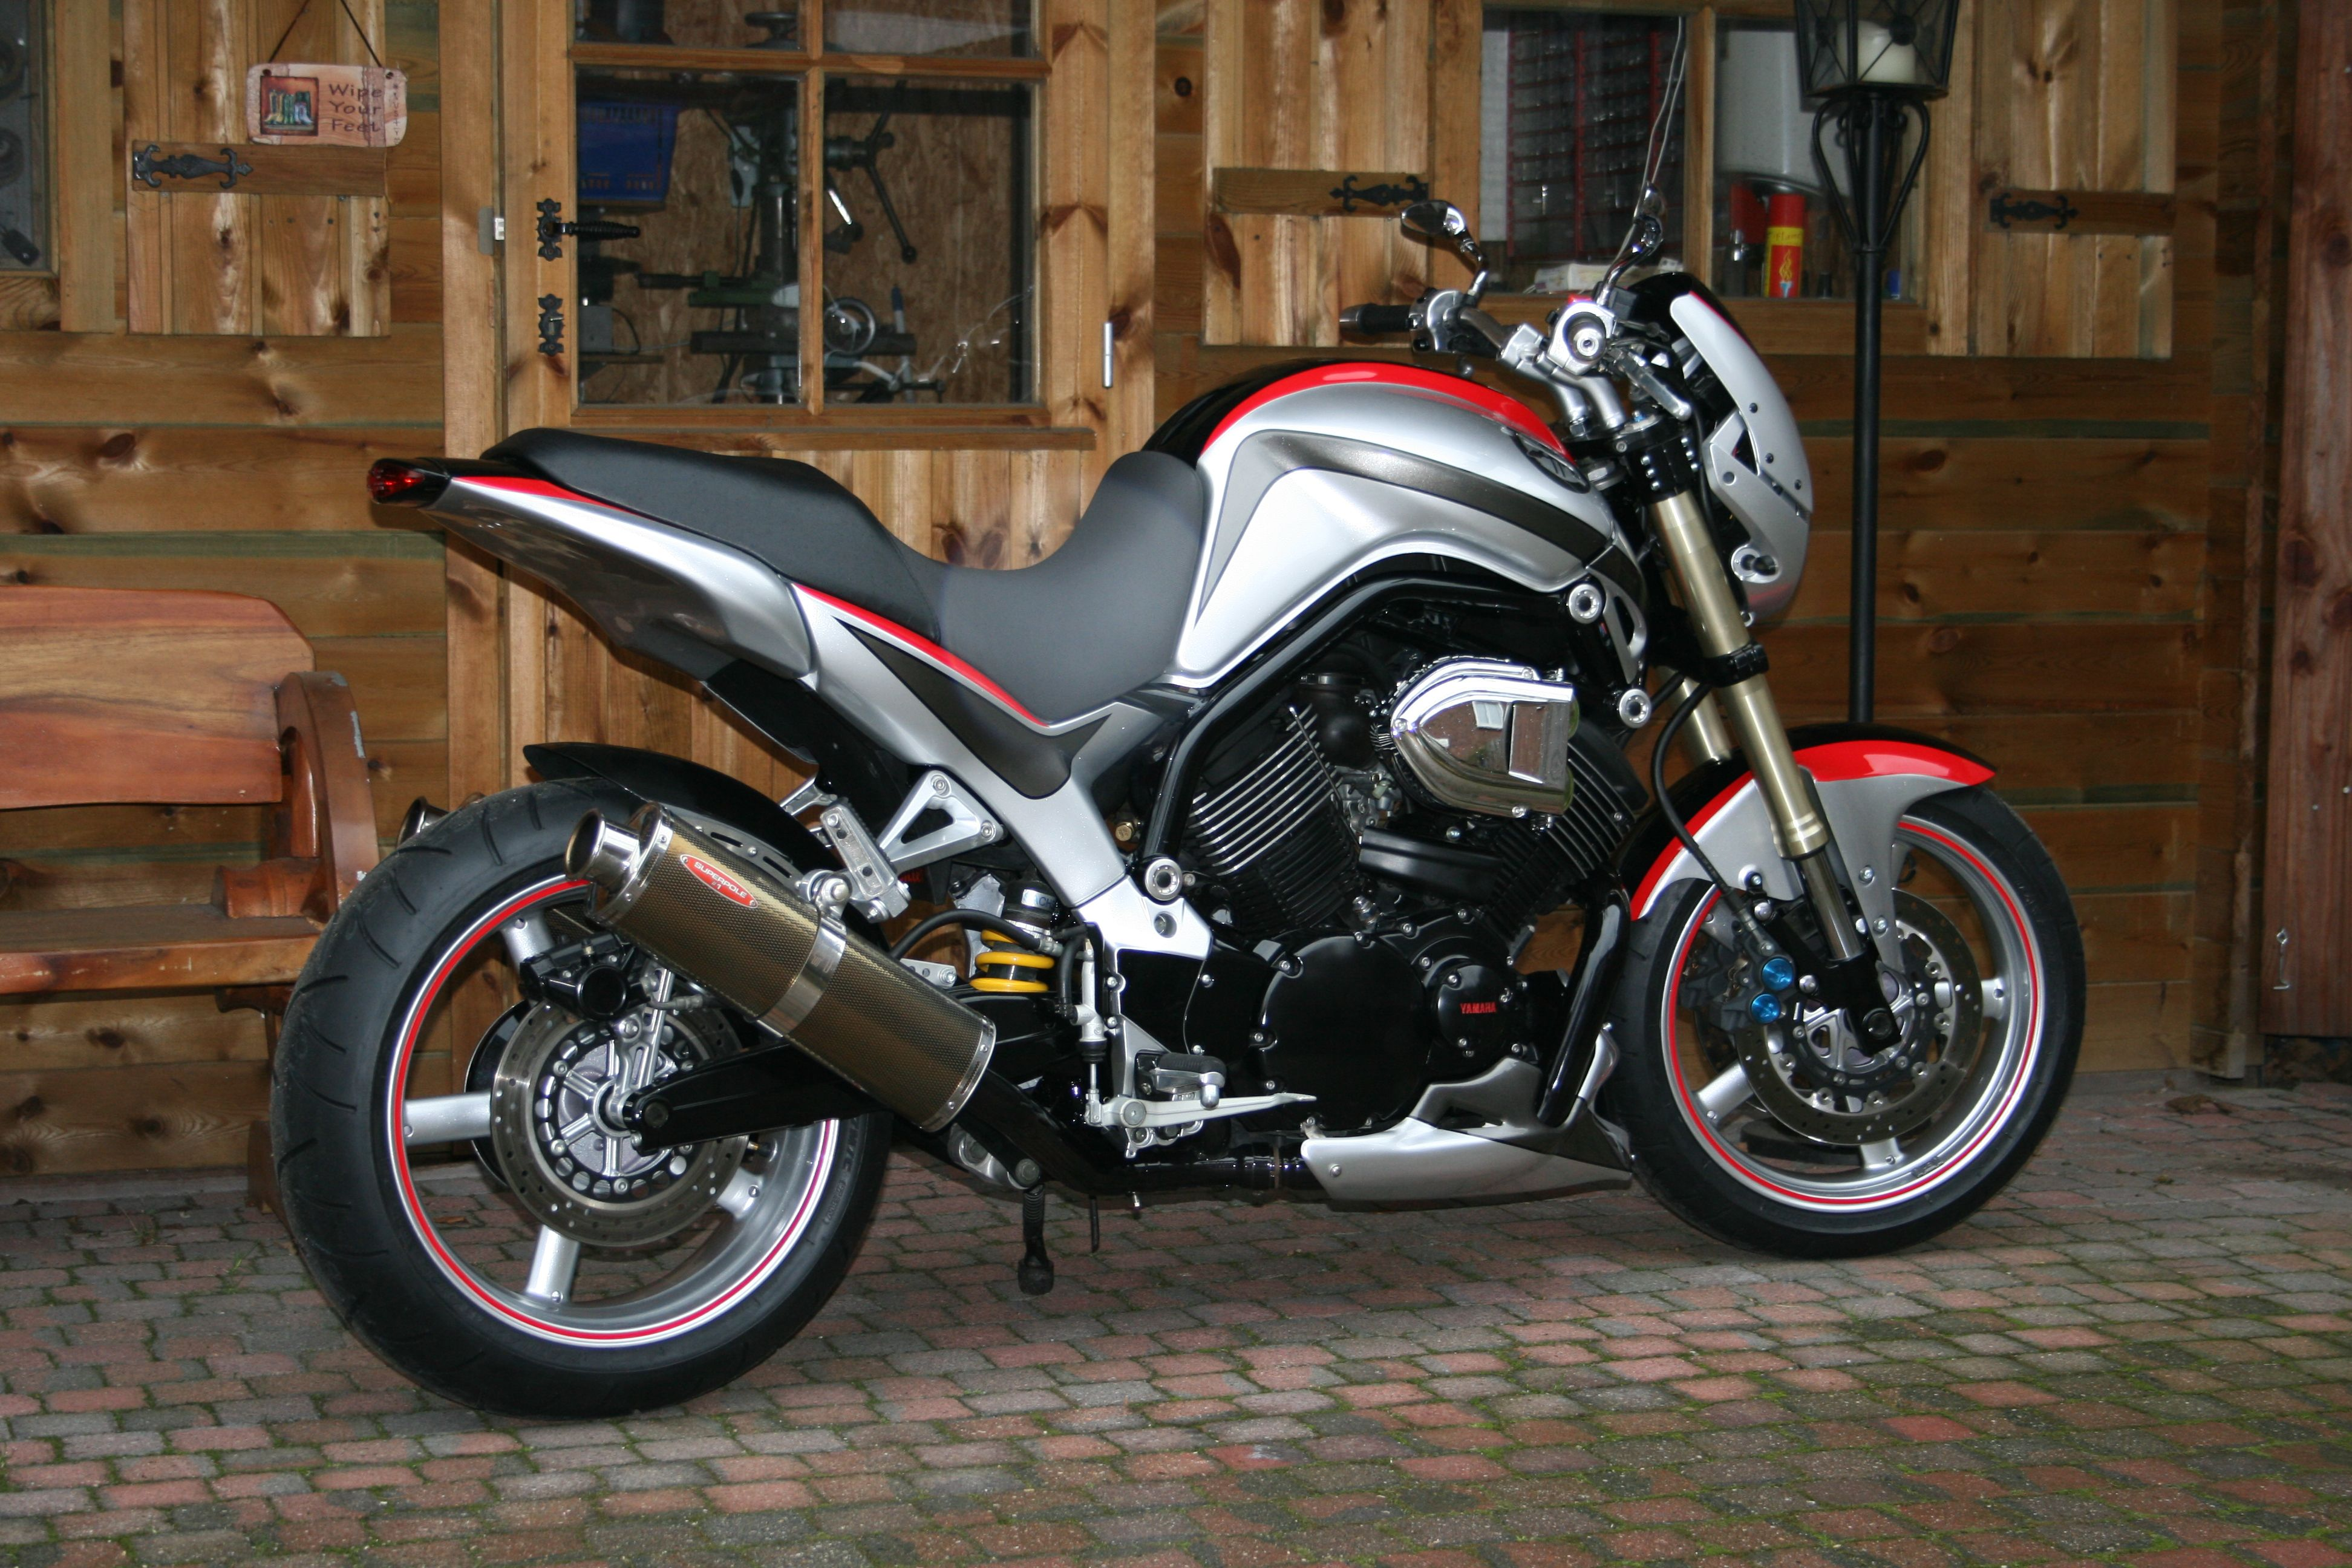 Super Bikes Custom Cafe Racer Yamaha Mixer Motorcycles Biking Bubbles Bicycling